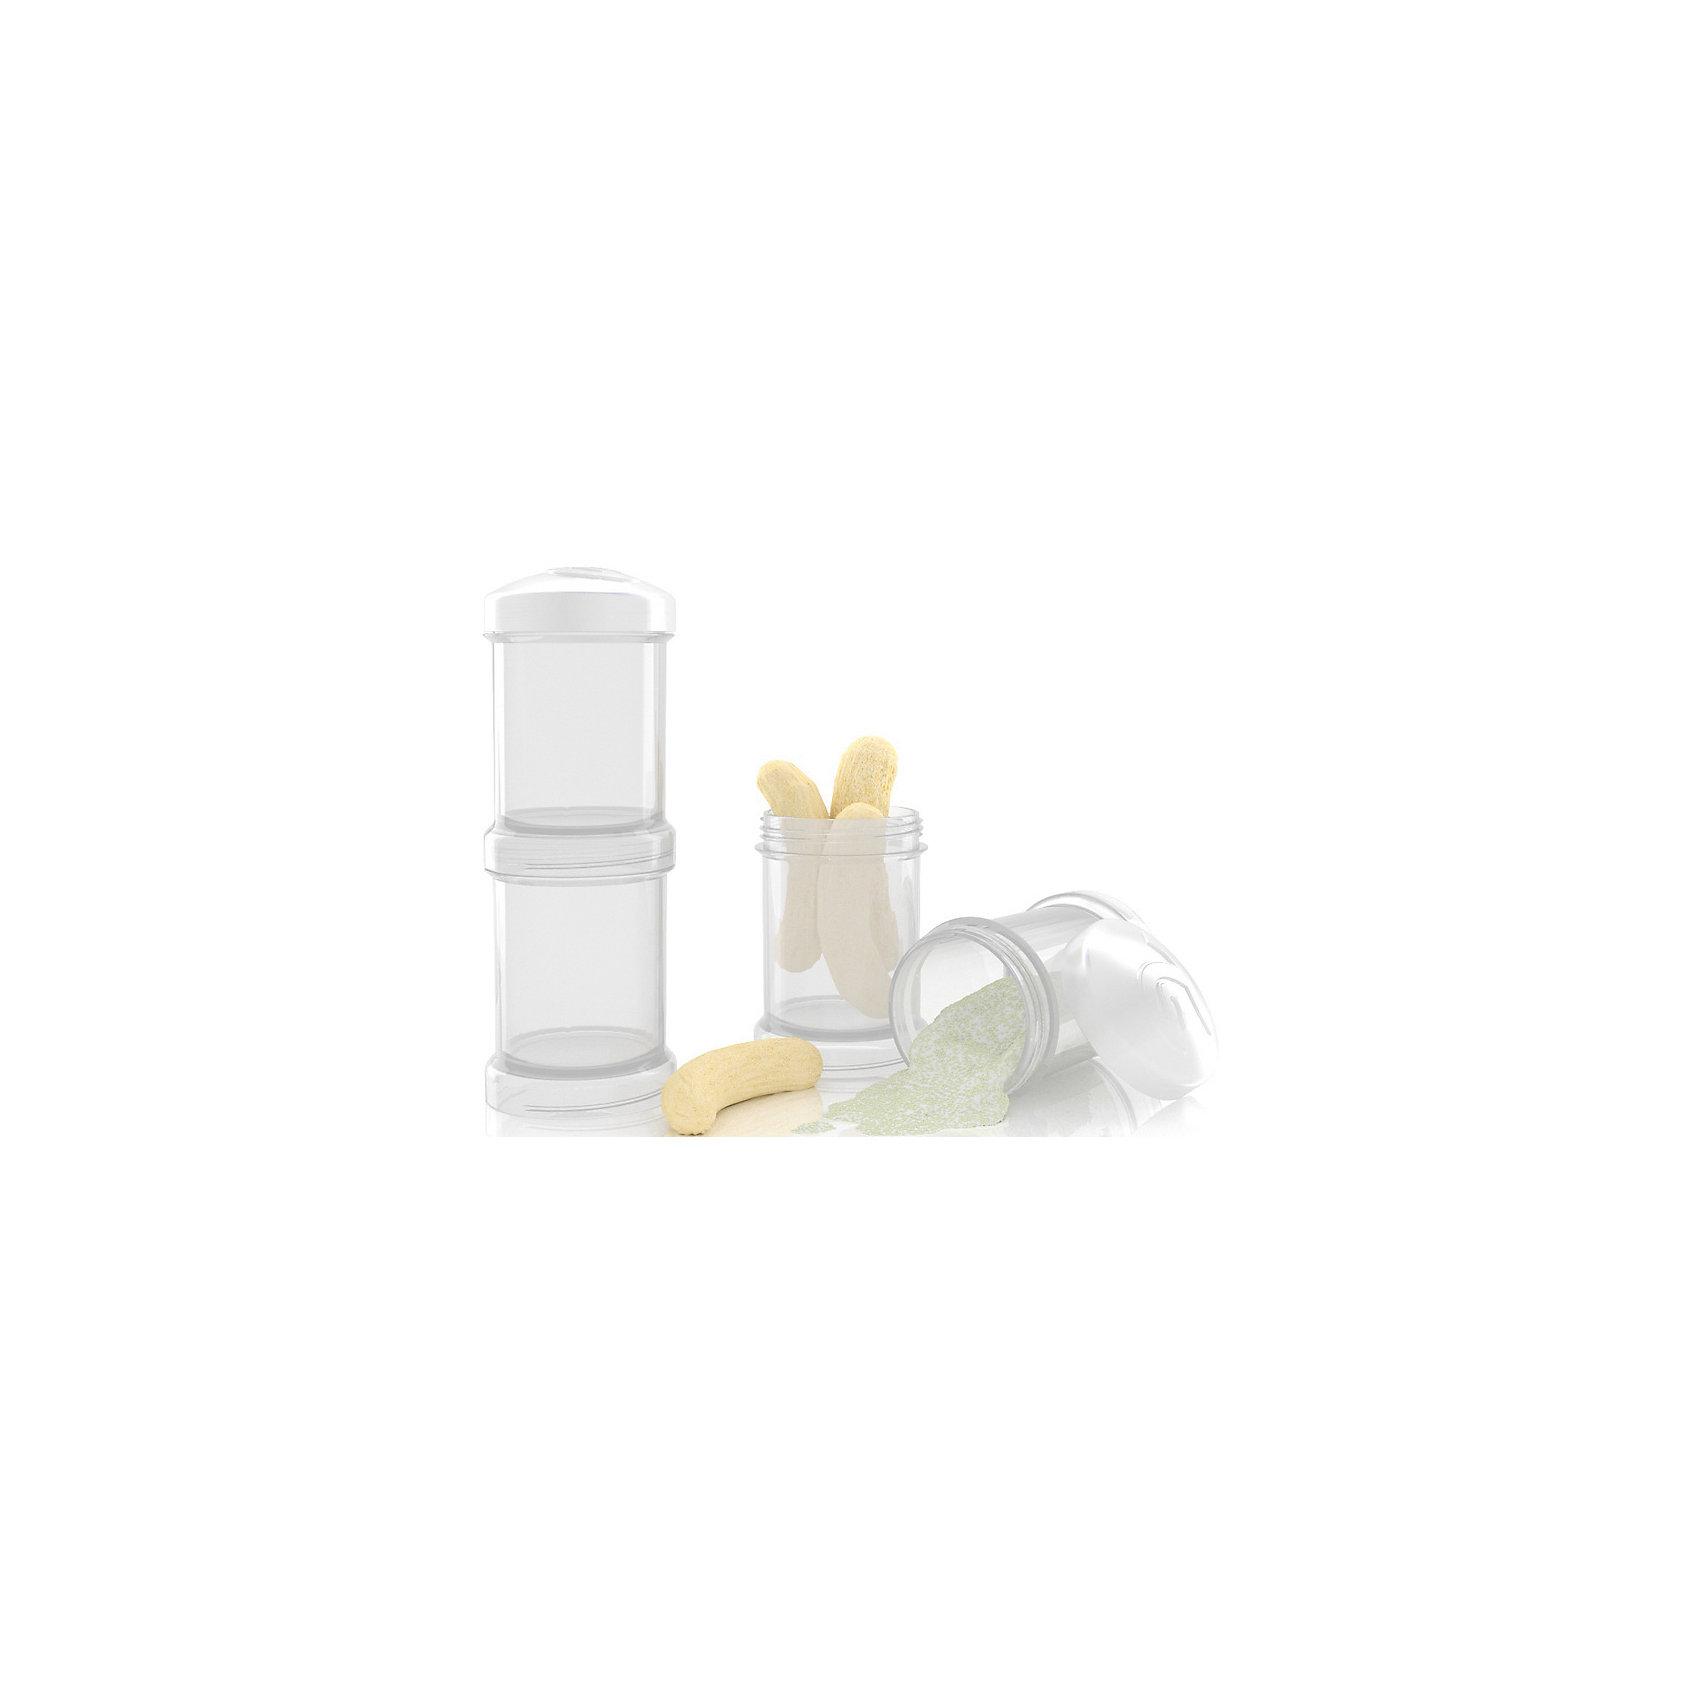 Контейнер для сухой смеси 100 мл. 2 шт., TwistShake, белый (Twistshake)